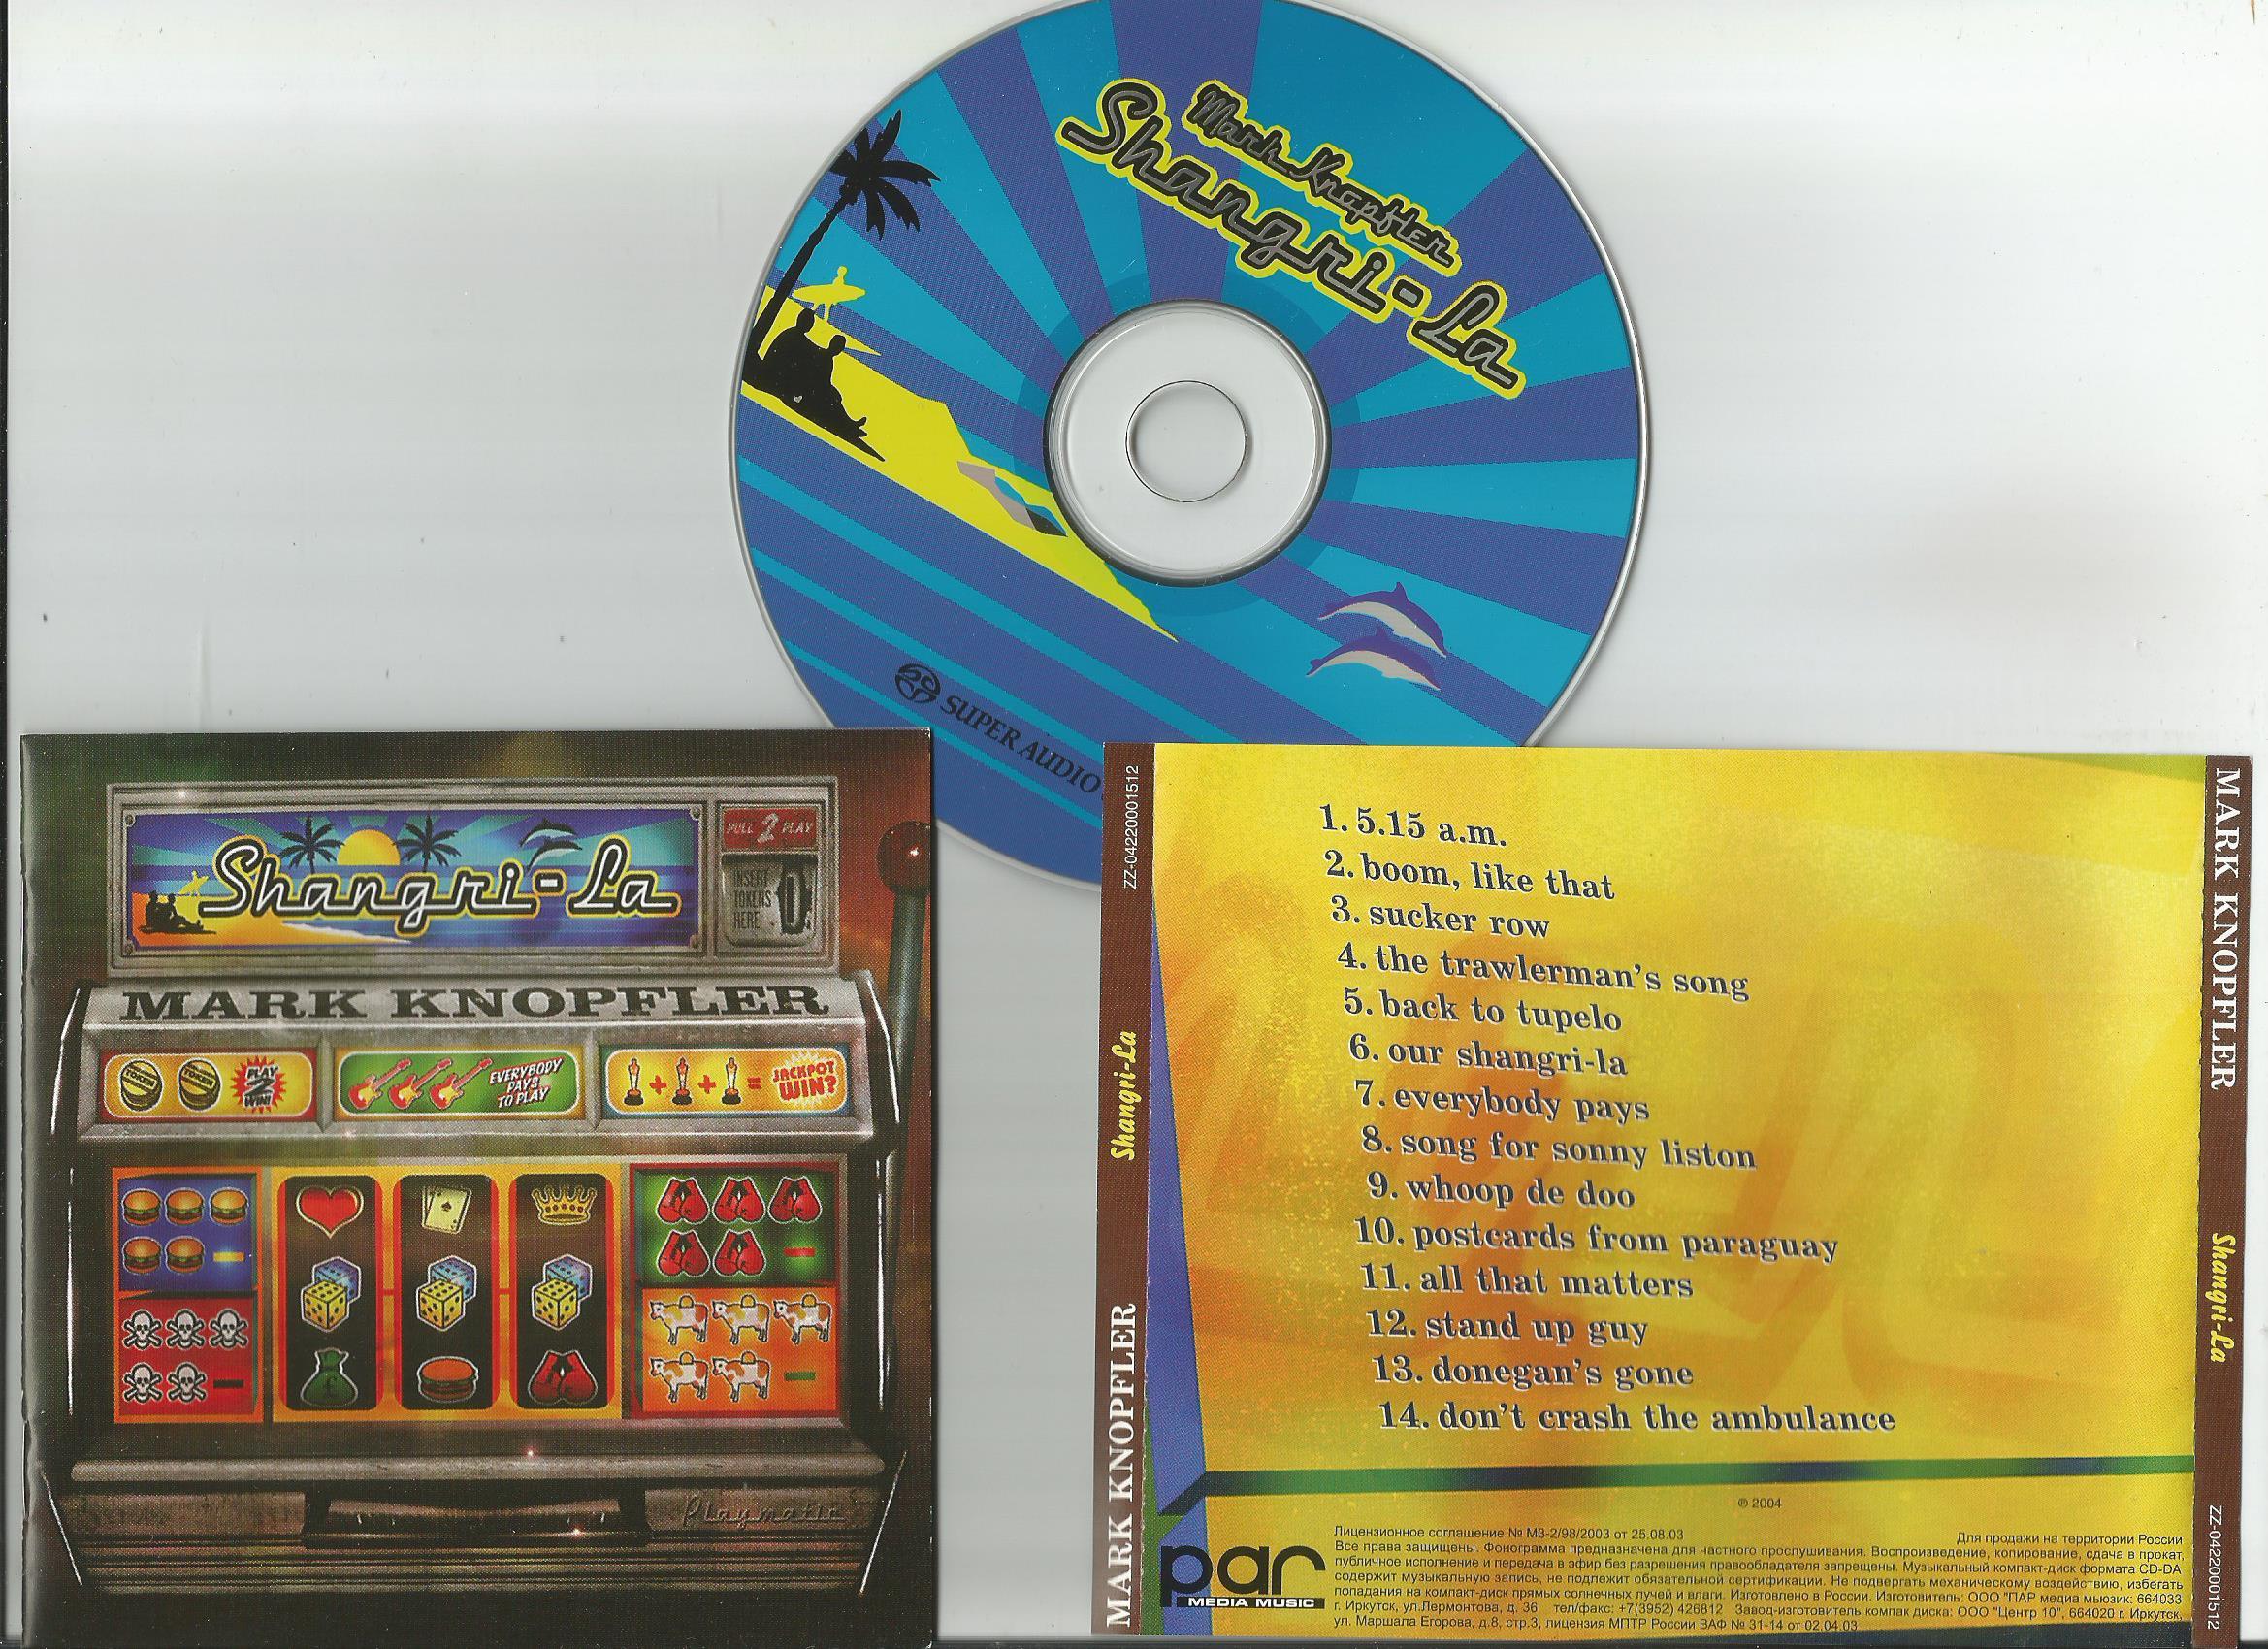 Mark Knopfler Shangri La Records Lps Vinyl And Cds